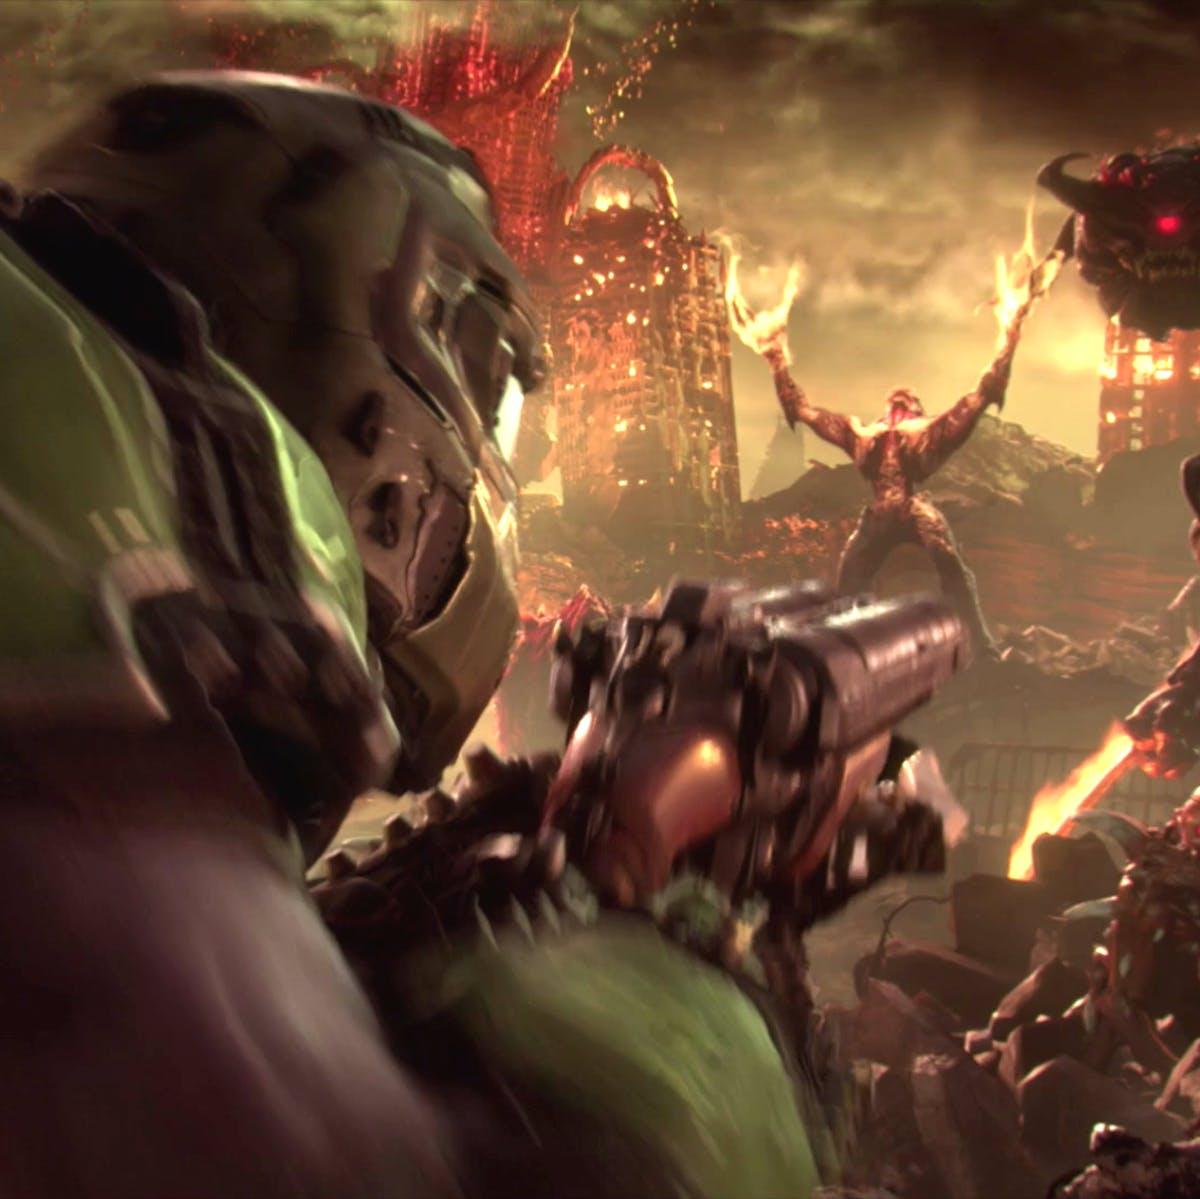 'DOOM Eternal' is unapologetic, high-octane video game junk food